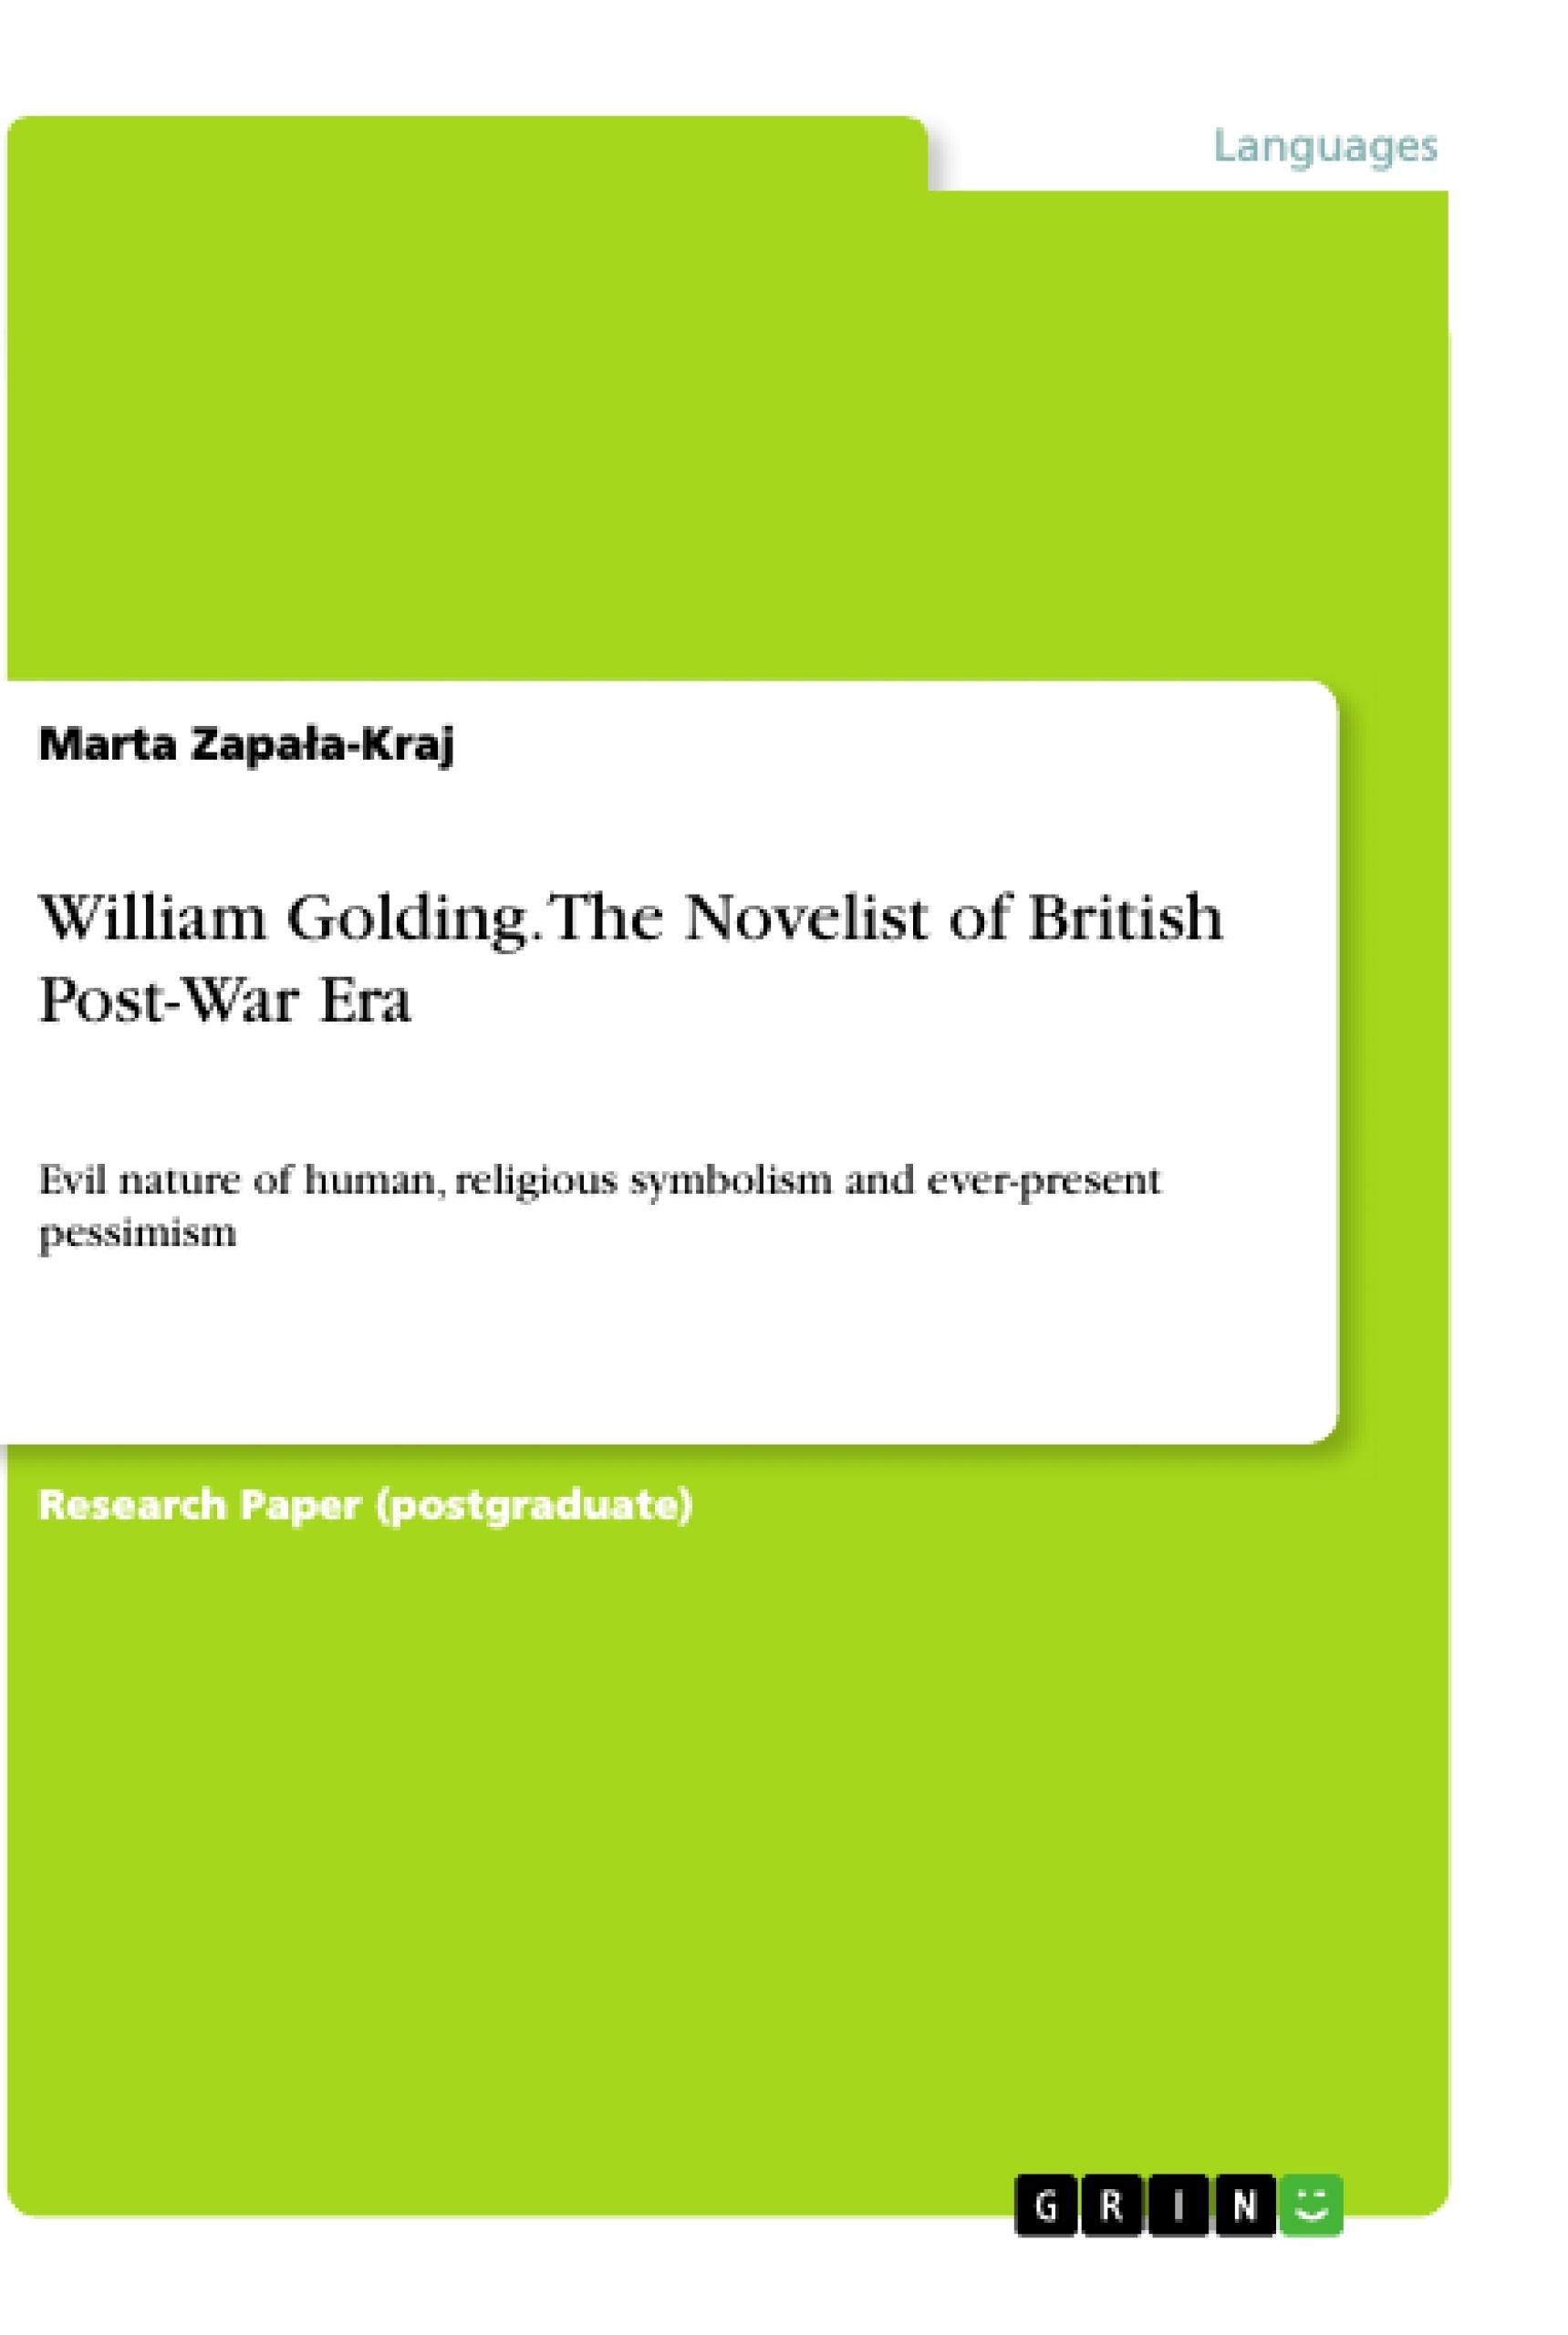 Title: William Golding. The Novelist of British Post-War Era